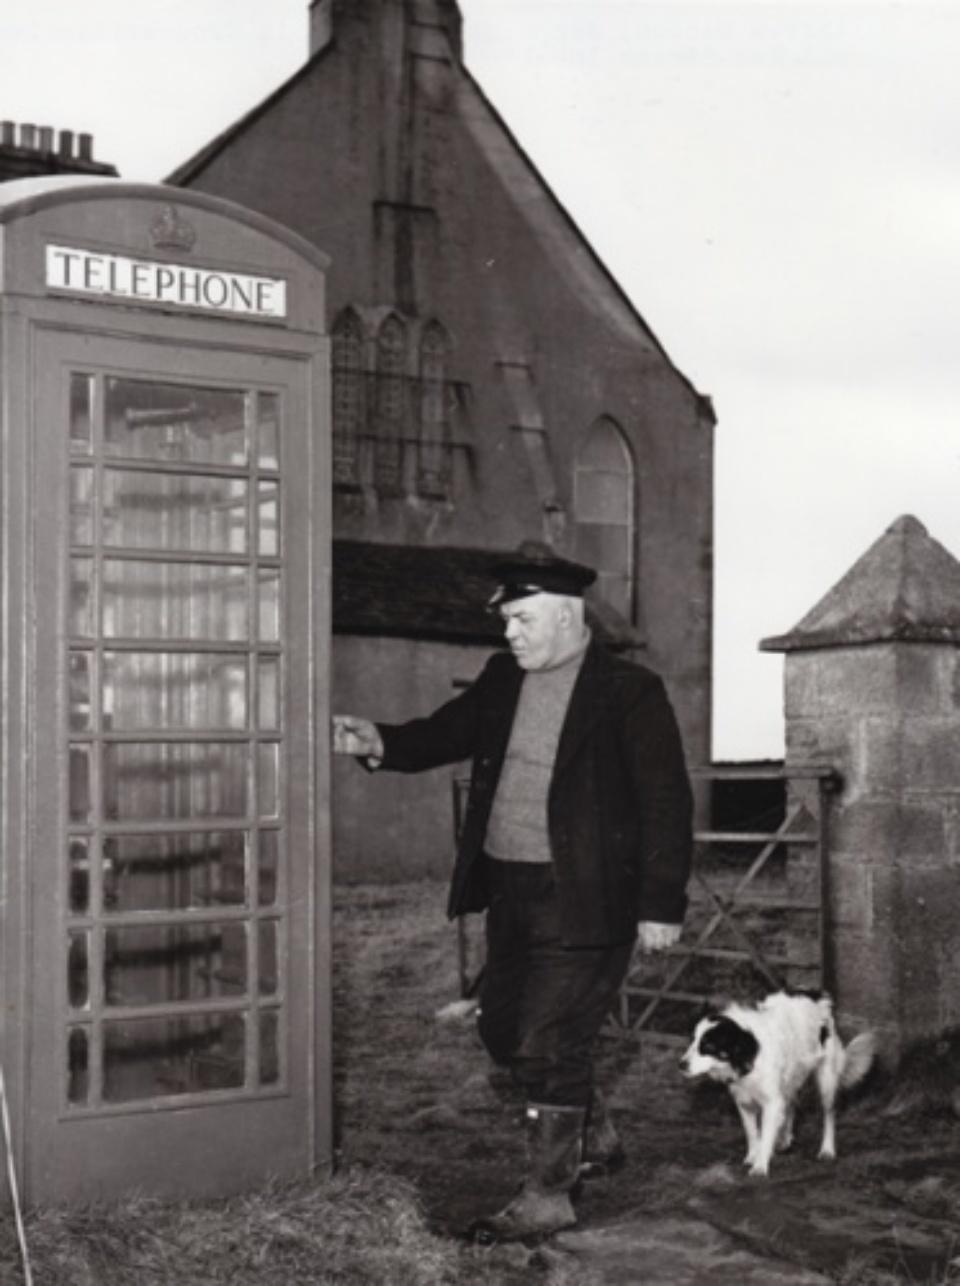 Vintage Press: Photograph Andrew Manson, the loneliest man in Britain 1960 Vintage gelatin silver print 16,7 x 21,5 cm